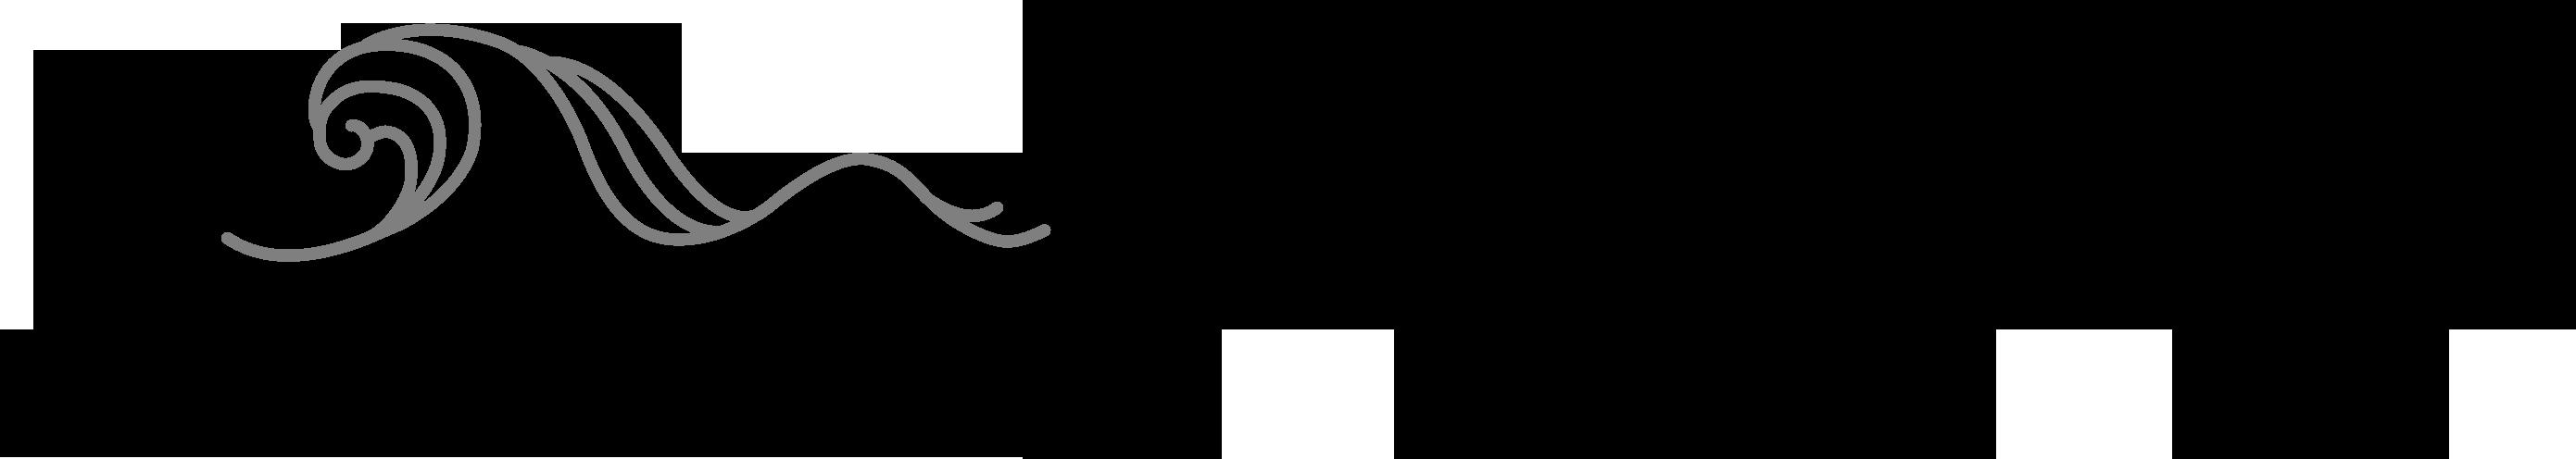 Heat clipart specific heat. Logo danubeheat schwarz png